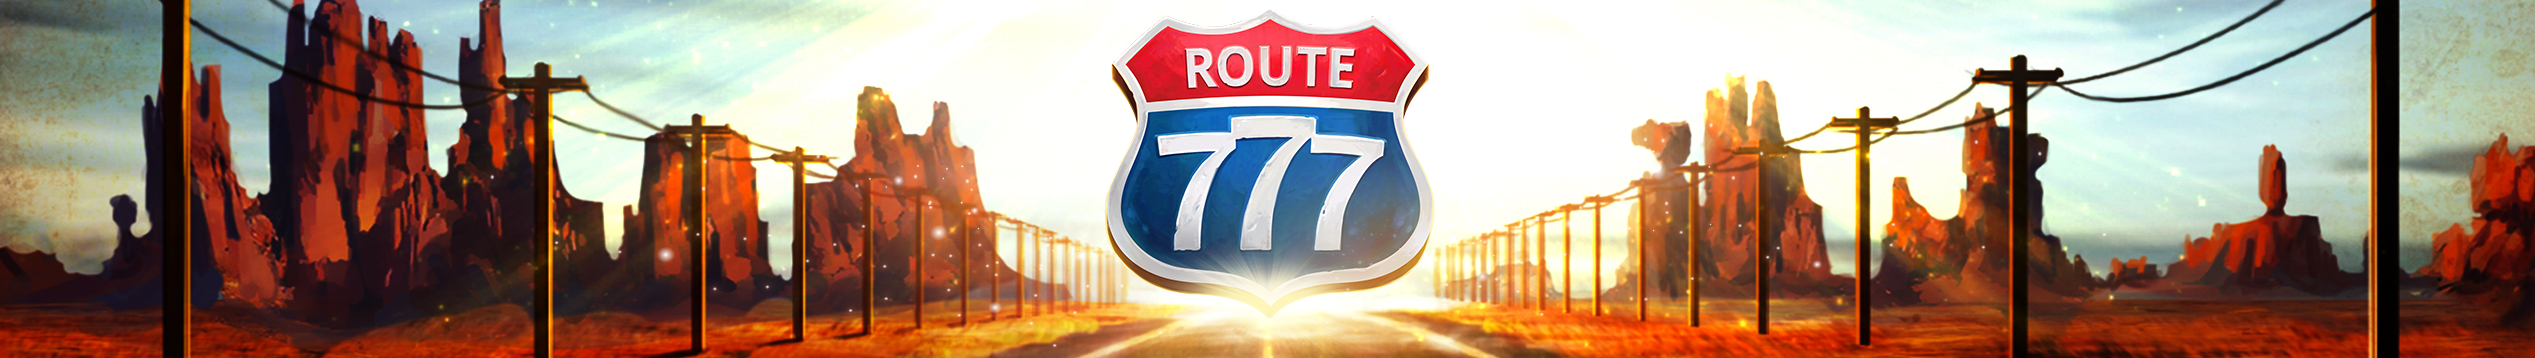 Testa nya Route 777